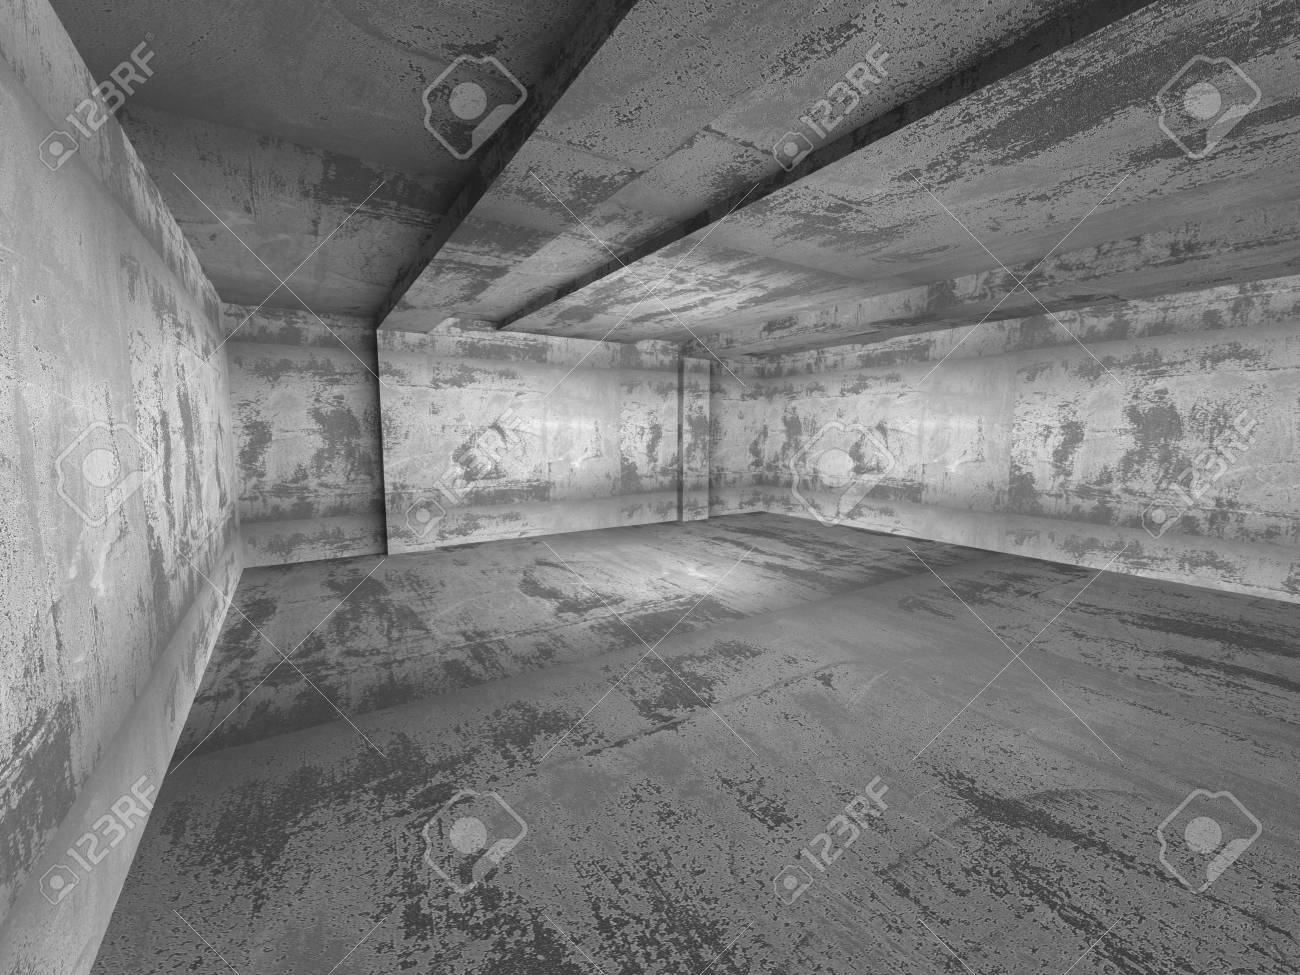 Concrete Empty Dark Room Interior Industrial Architecture Background 3d Render Illustration Stock